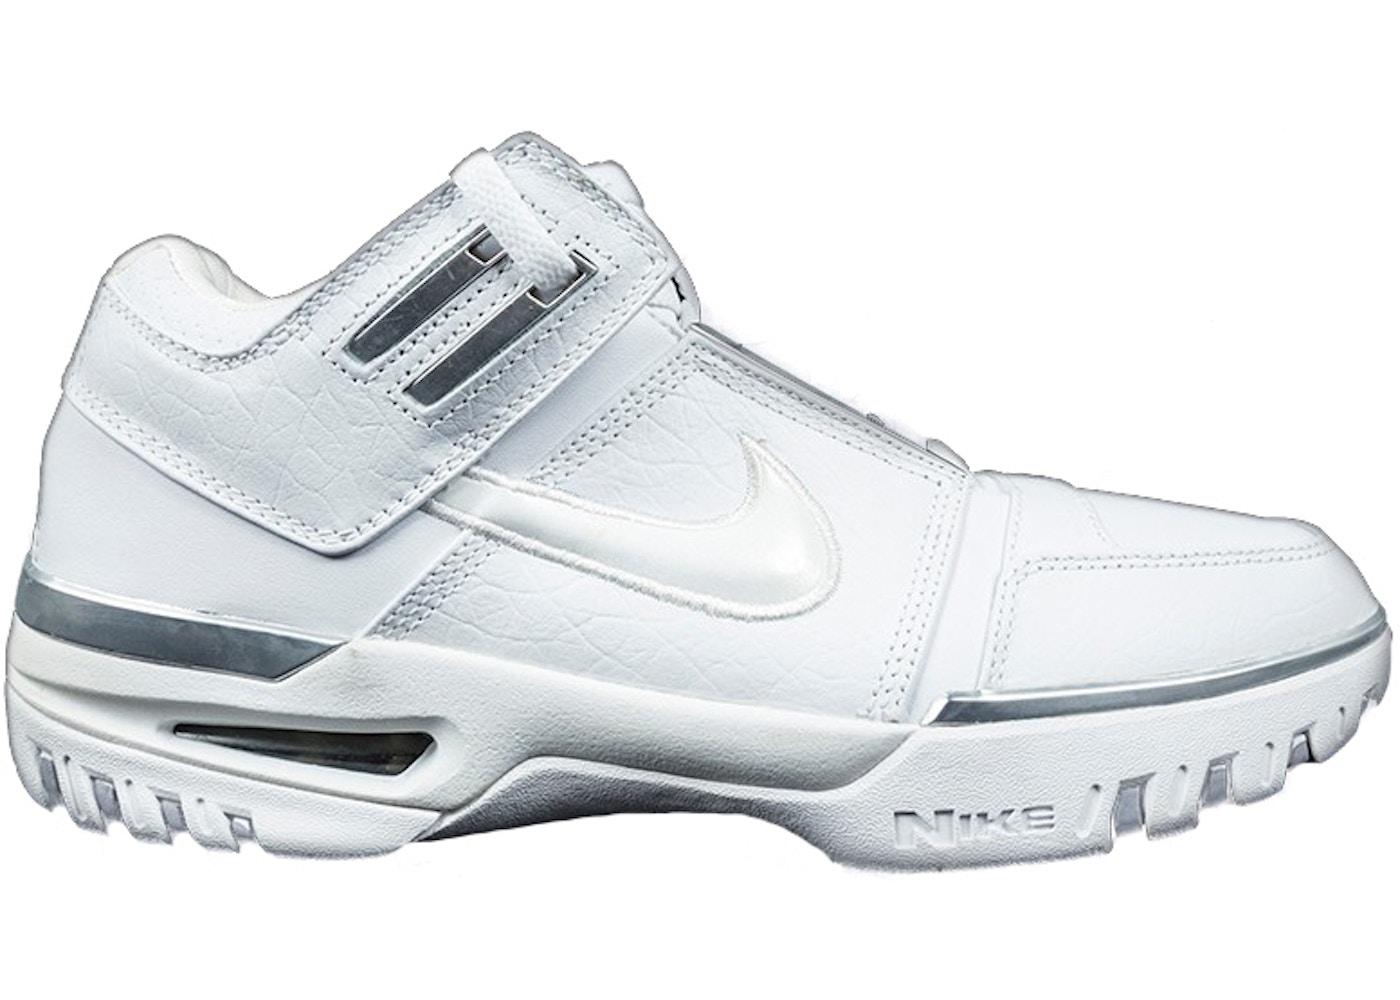 77c4a3b7199 Buy Nike LeBron 1 Shoes   Deadstock Sneakers